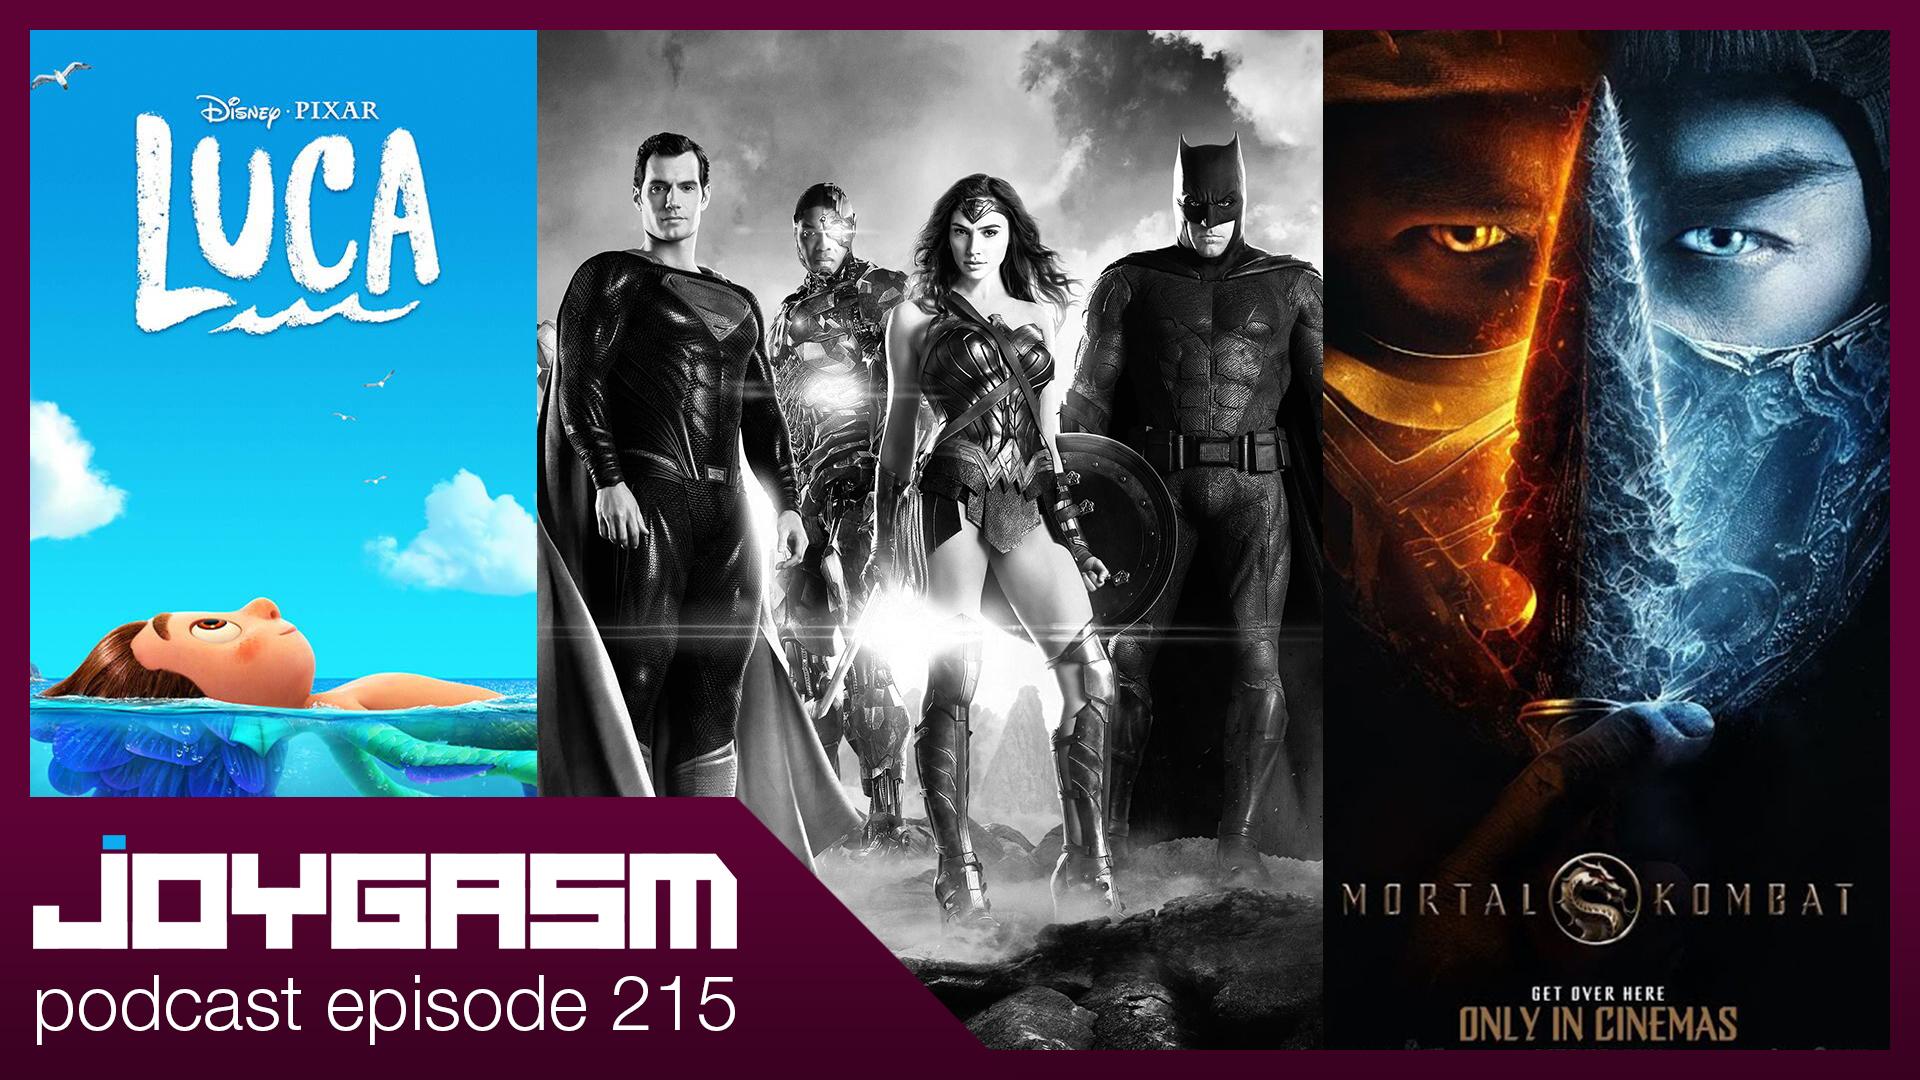 Ep 215: Mortal Kombat, Luca, & Zack Snyder Justice League Trailer Reactions